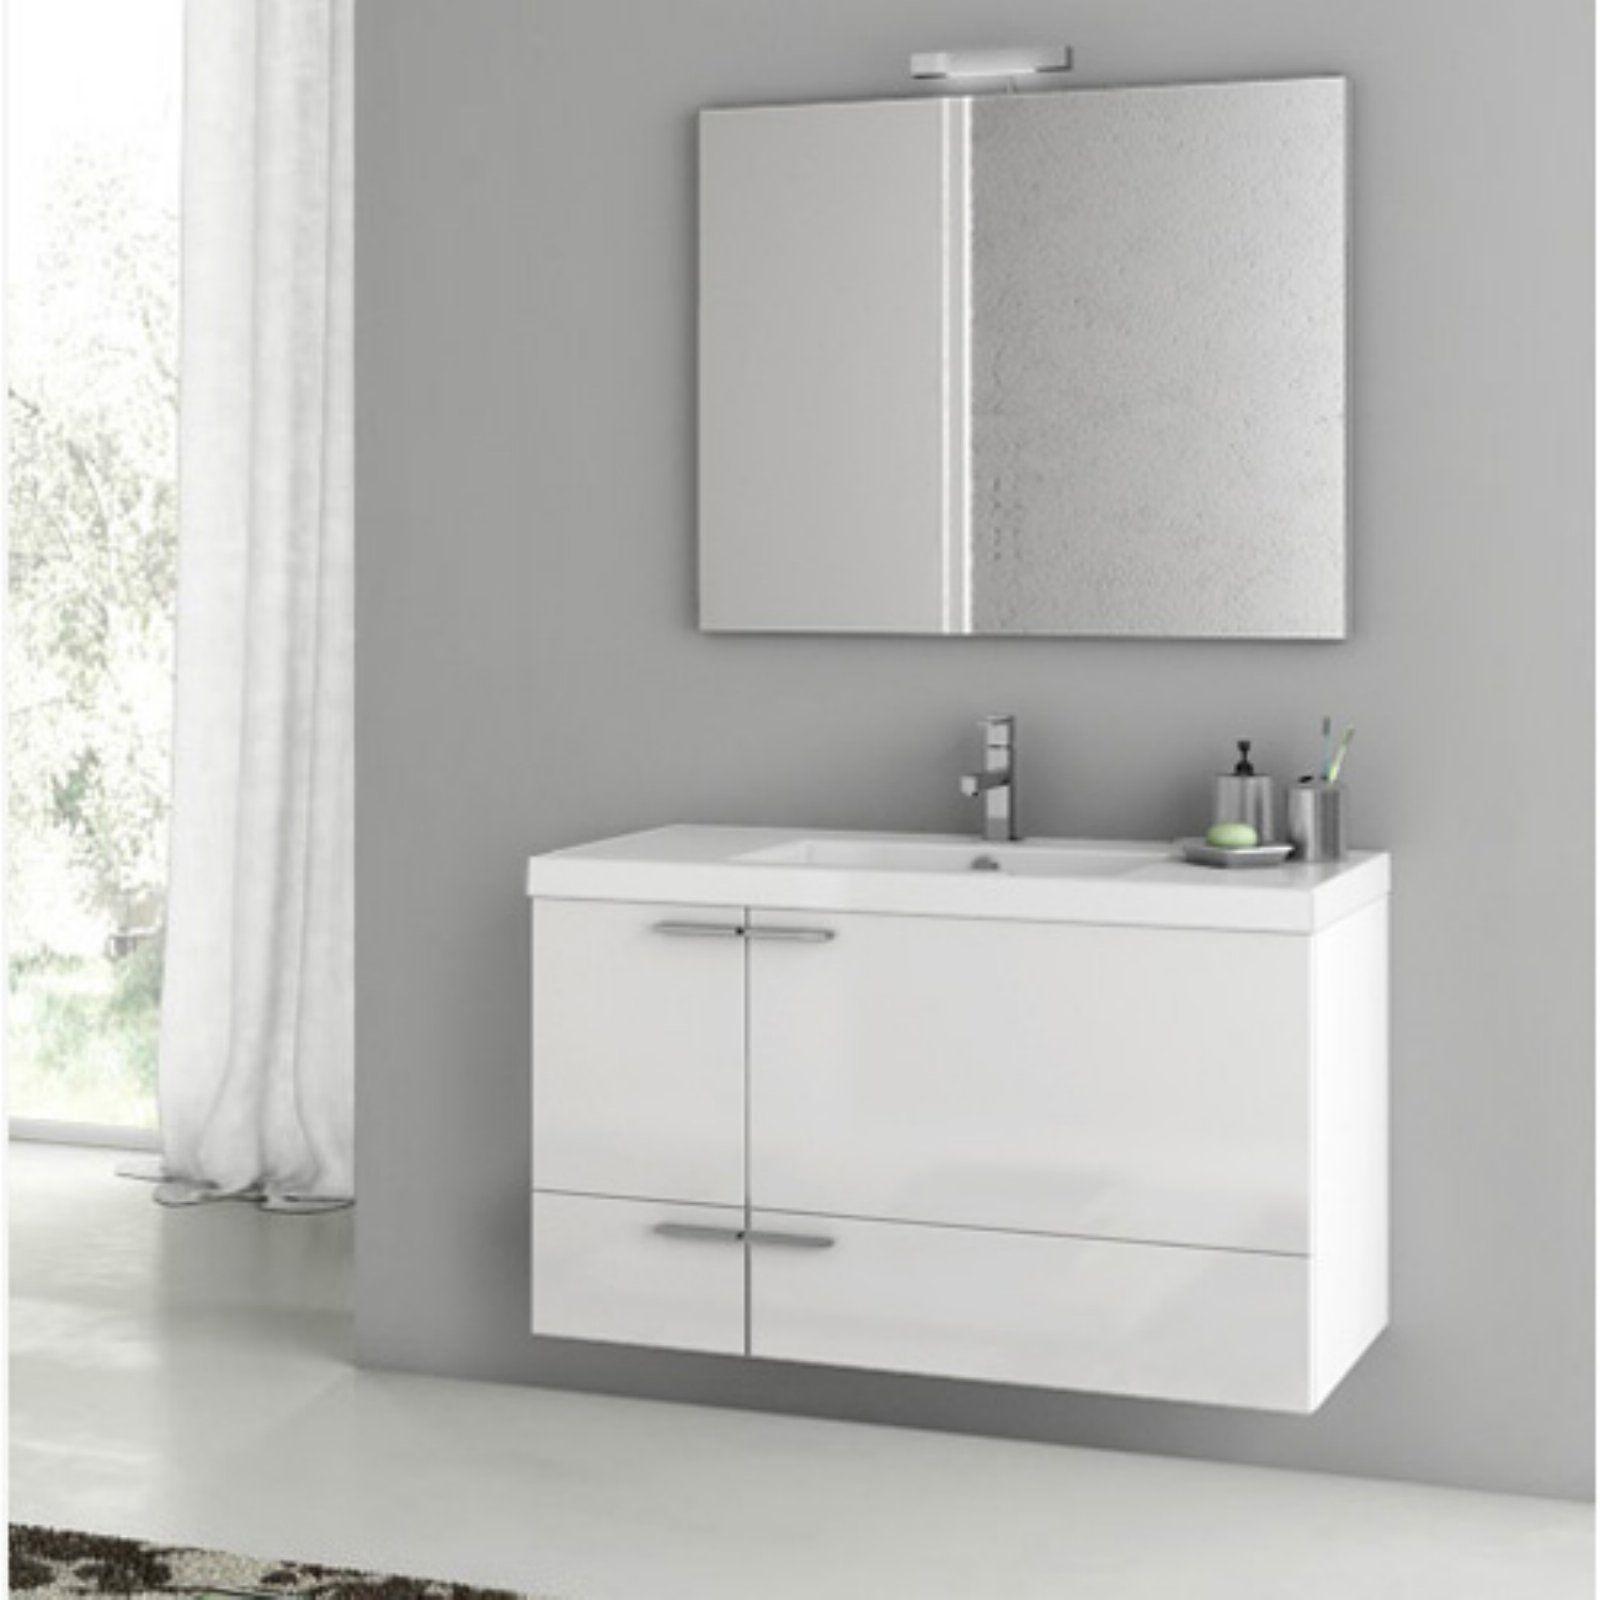 Acf By Nameeks Acf Ans22 Gw New Space 39 In Single Bathroom